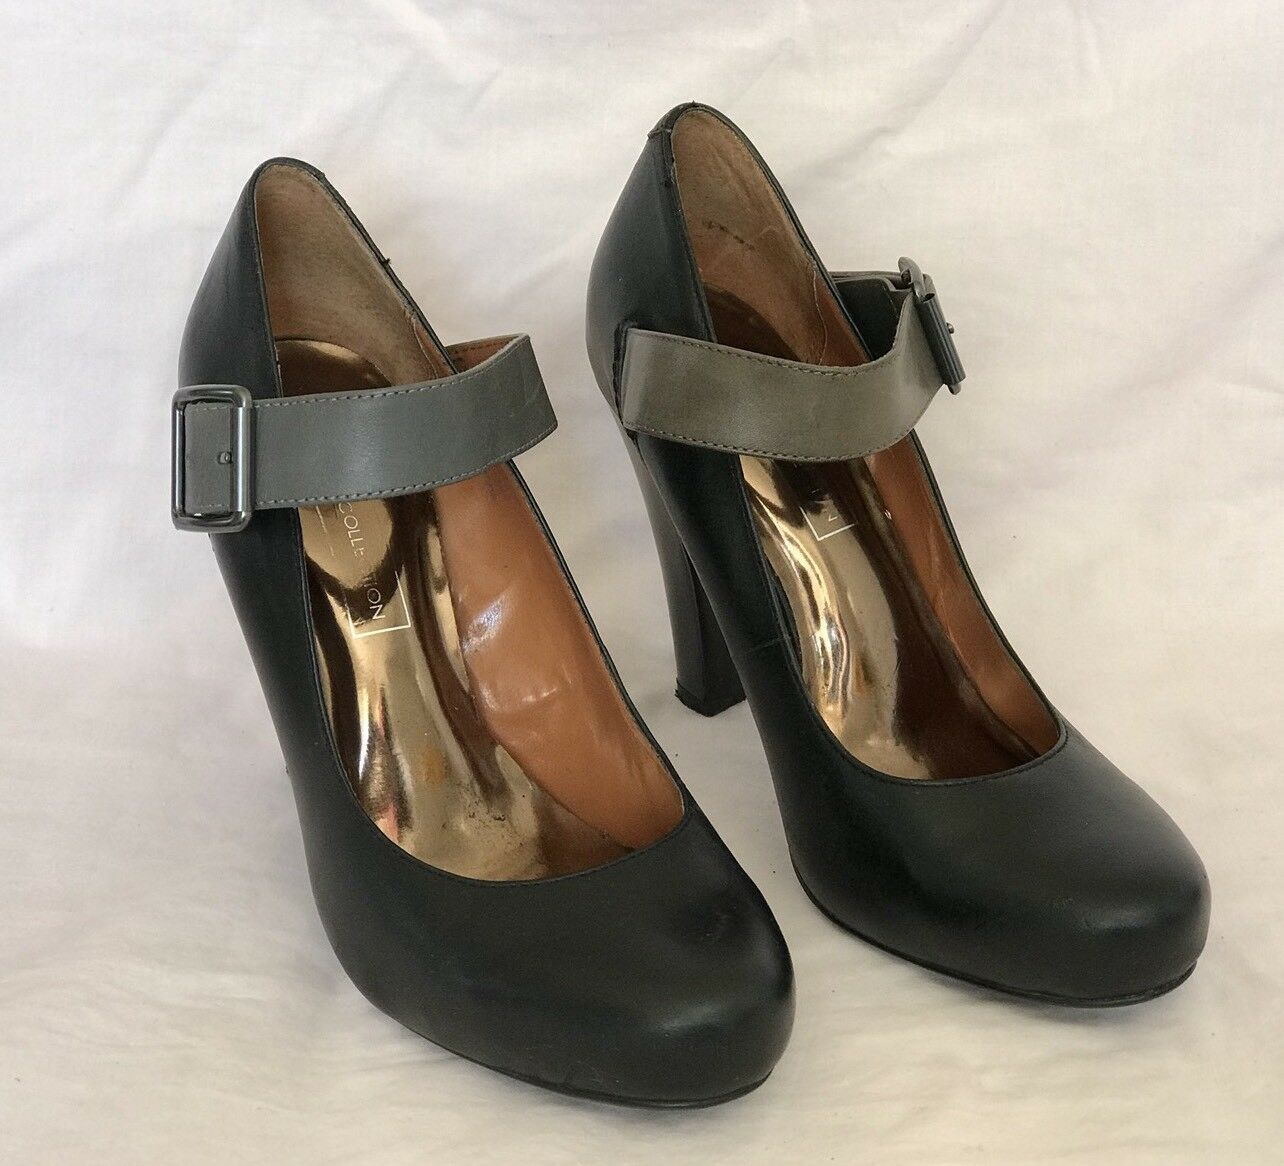 M&S Limited Collection Insolia ladies heels eur shoes size 5 , eur heels 38  ce0af1